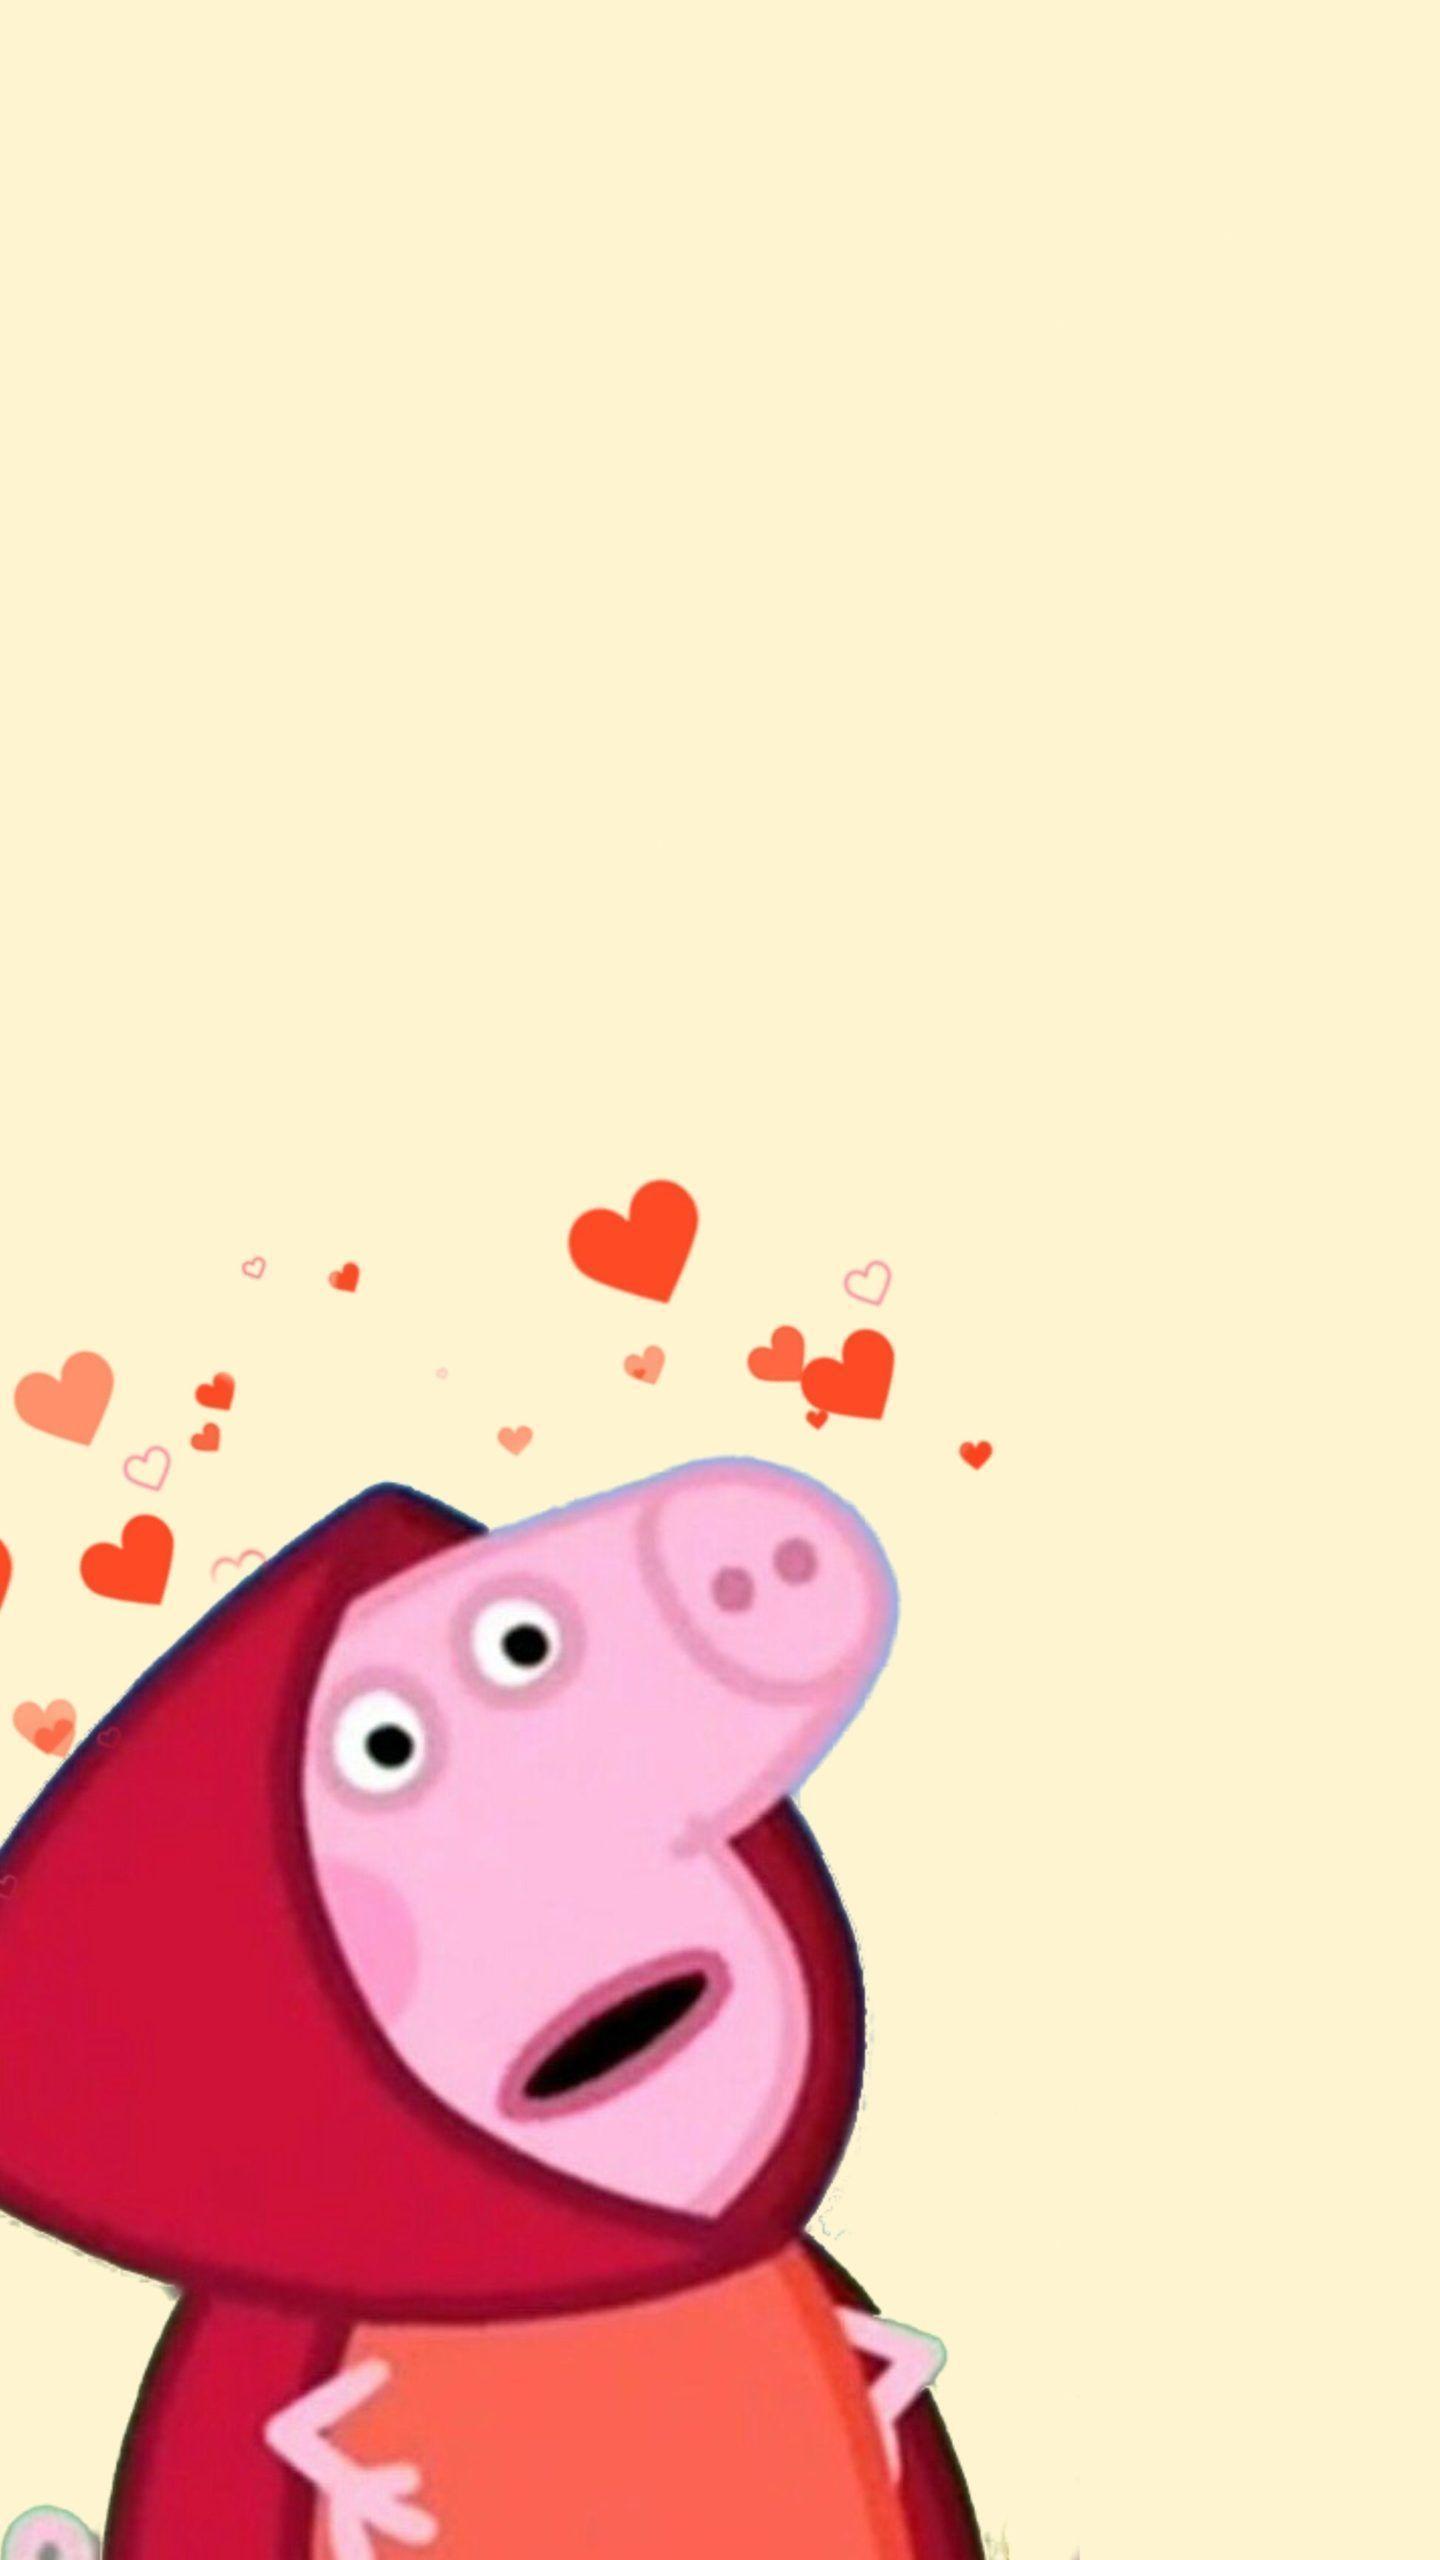 Memes Wallpaper Iphone Peppa Memes4ever Memesbelike Memestealer Get Your Free Iphone 11 Pro Or Peppa Pig Wallpaper Pig Wallpaper Funny Iphone Wallpaper